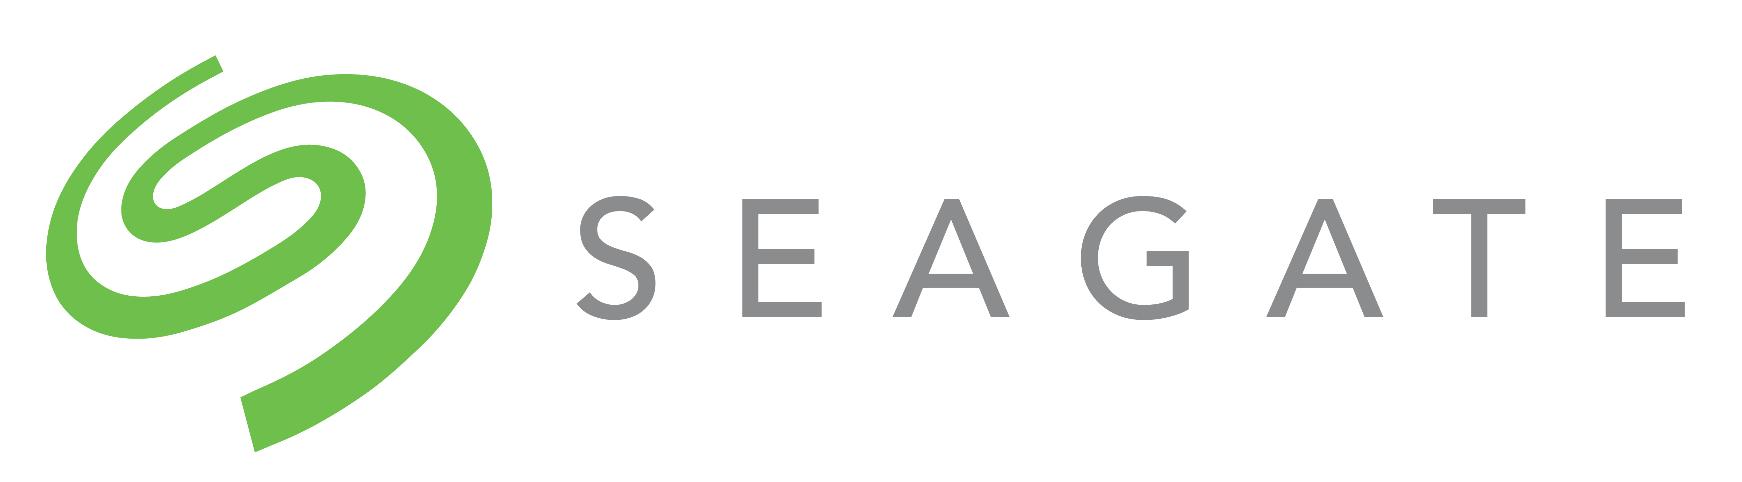 SEAGATE - SSD Ironwolf 125 2.5P 2TB SATA 6GB/s